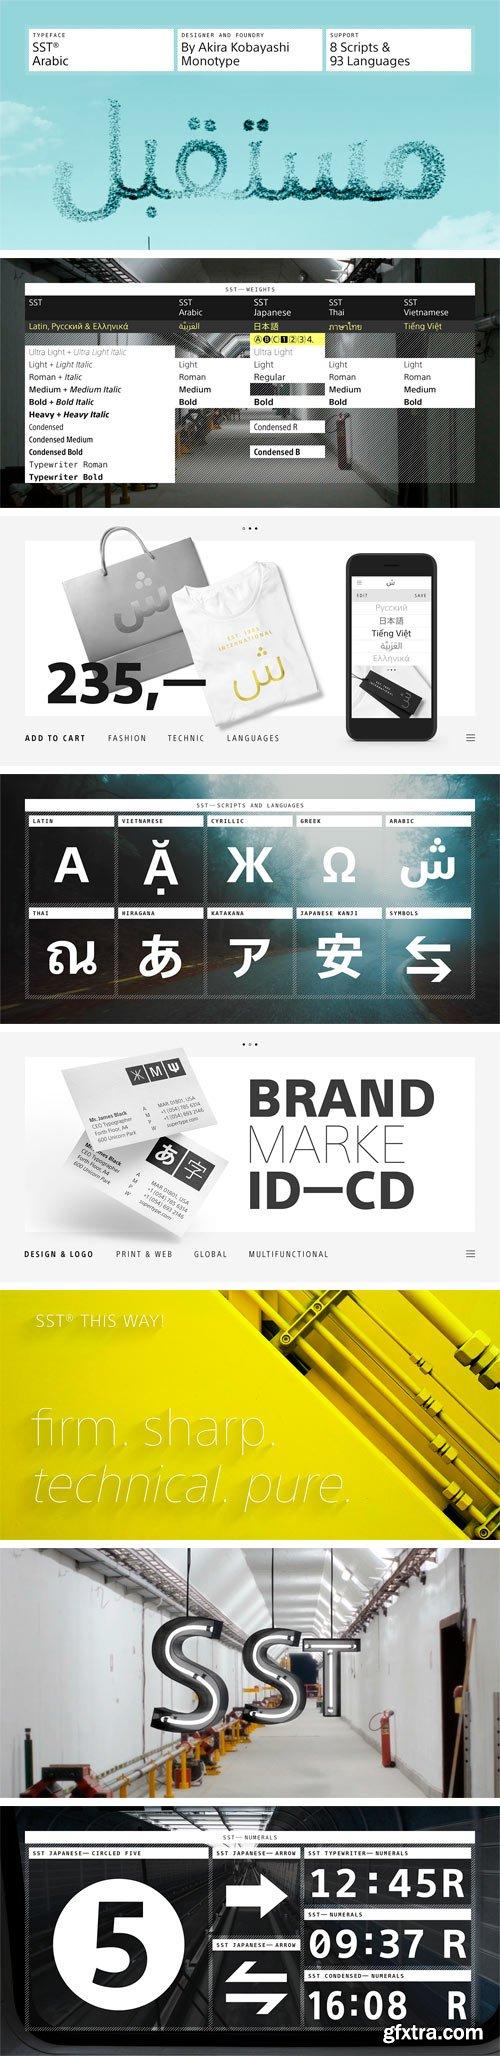 SST Arabic Font Family